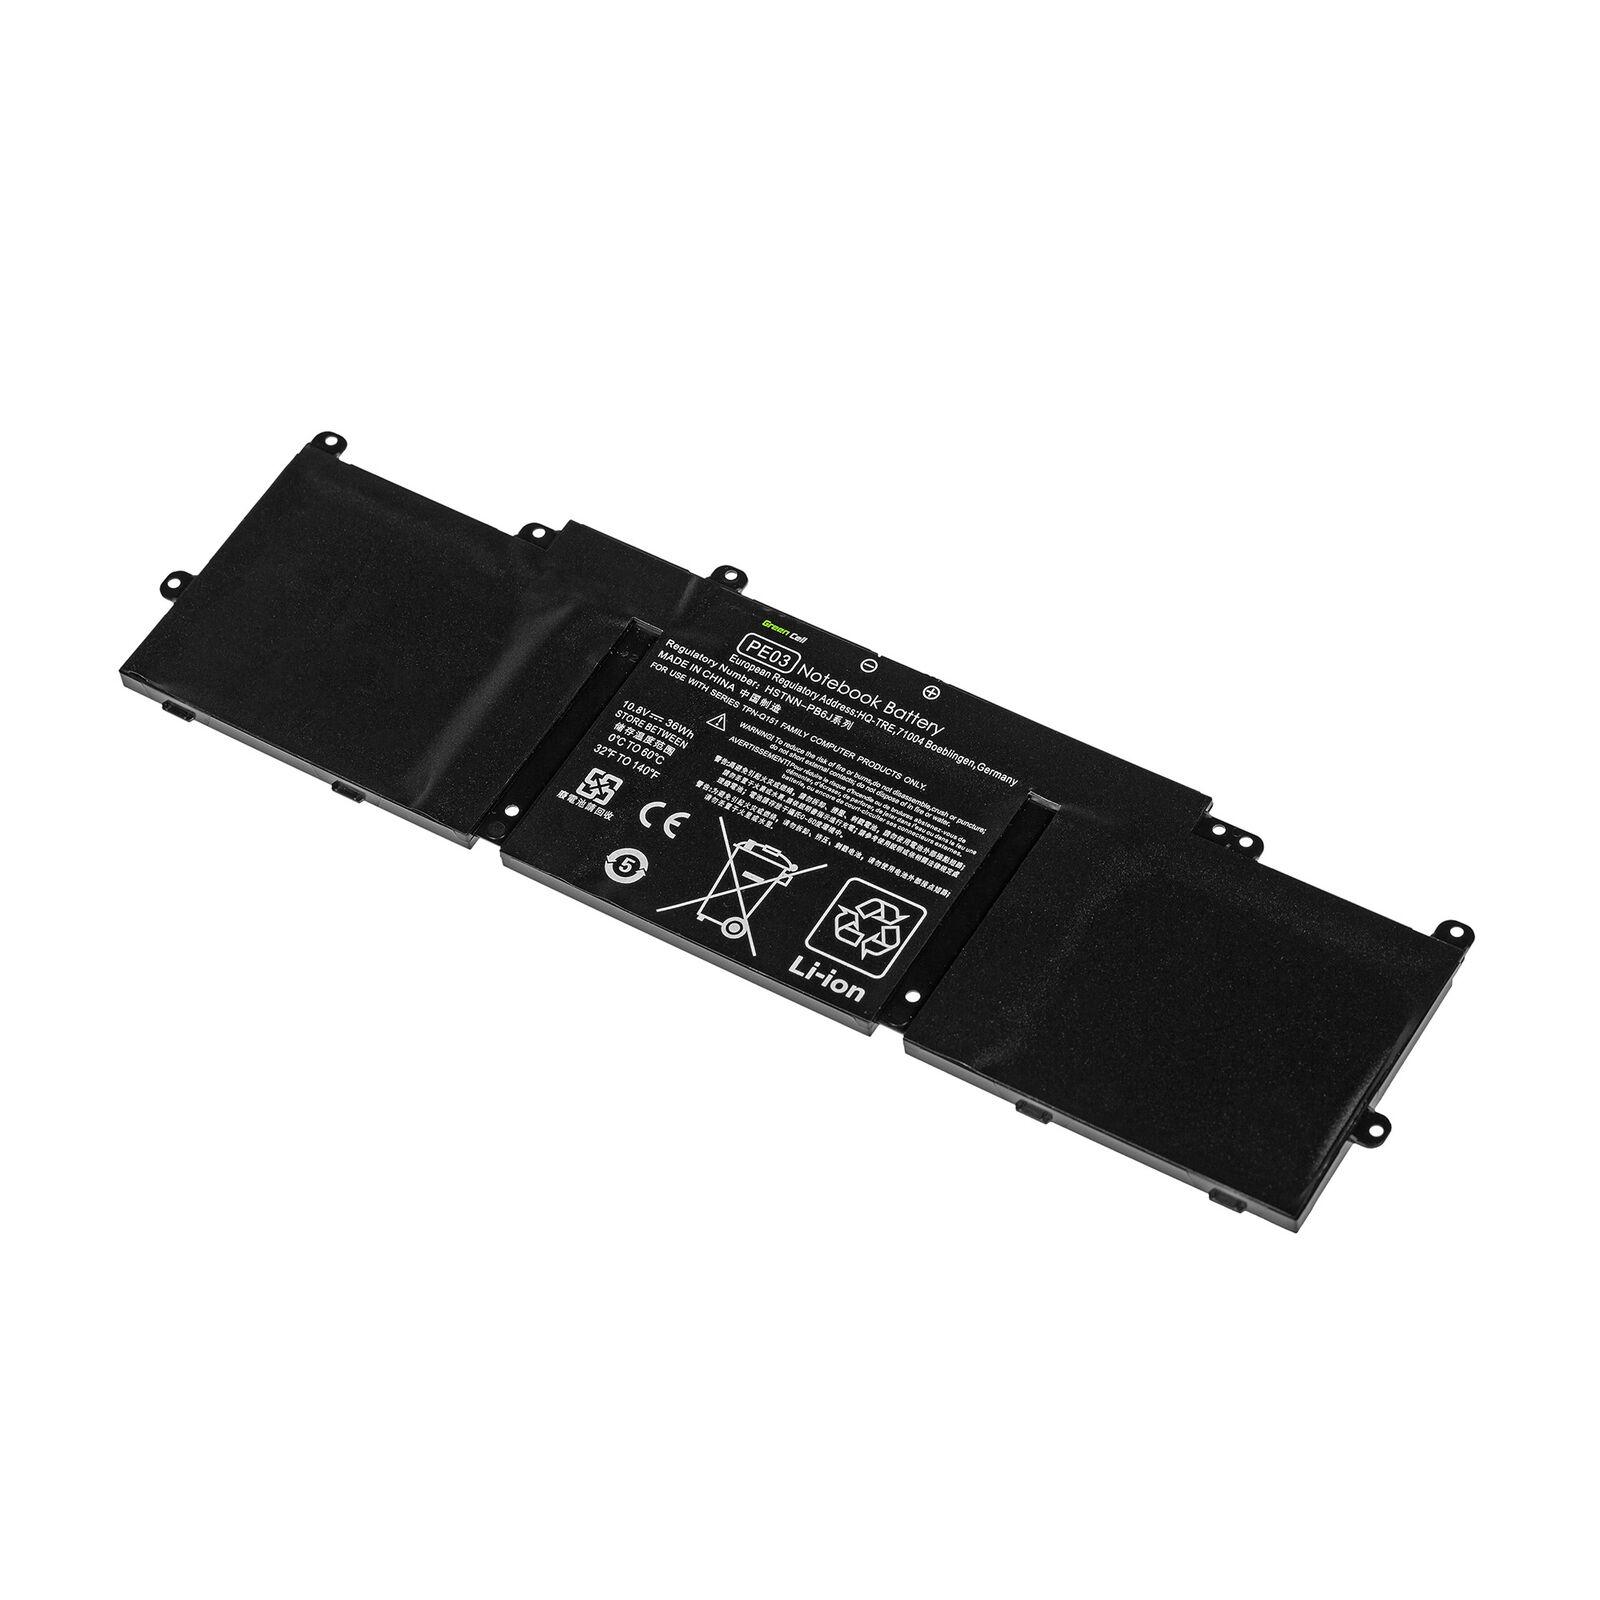 Accu voor HP Chromebook 11 G3 G4 11-2100 11-2200 PE03 PE03XL HSTNN-LB6M TPN-Q151(compatible)